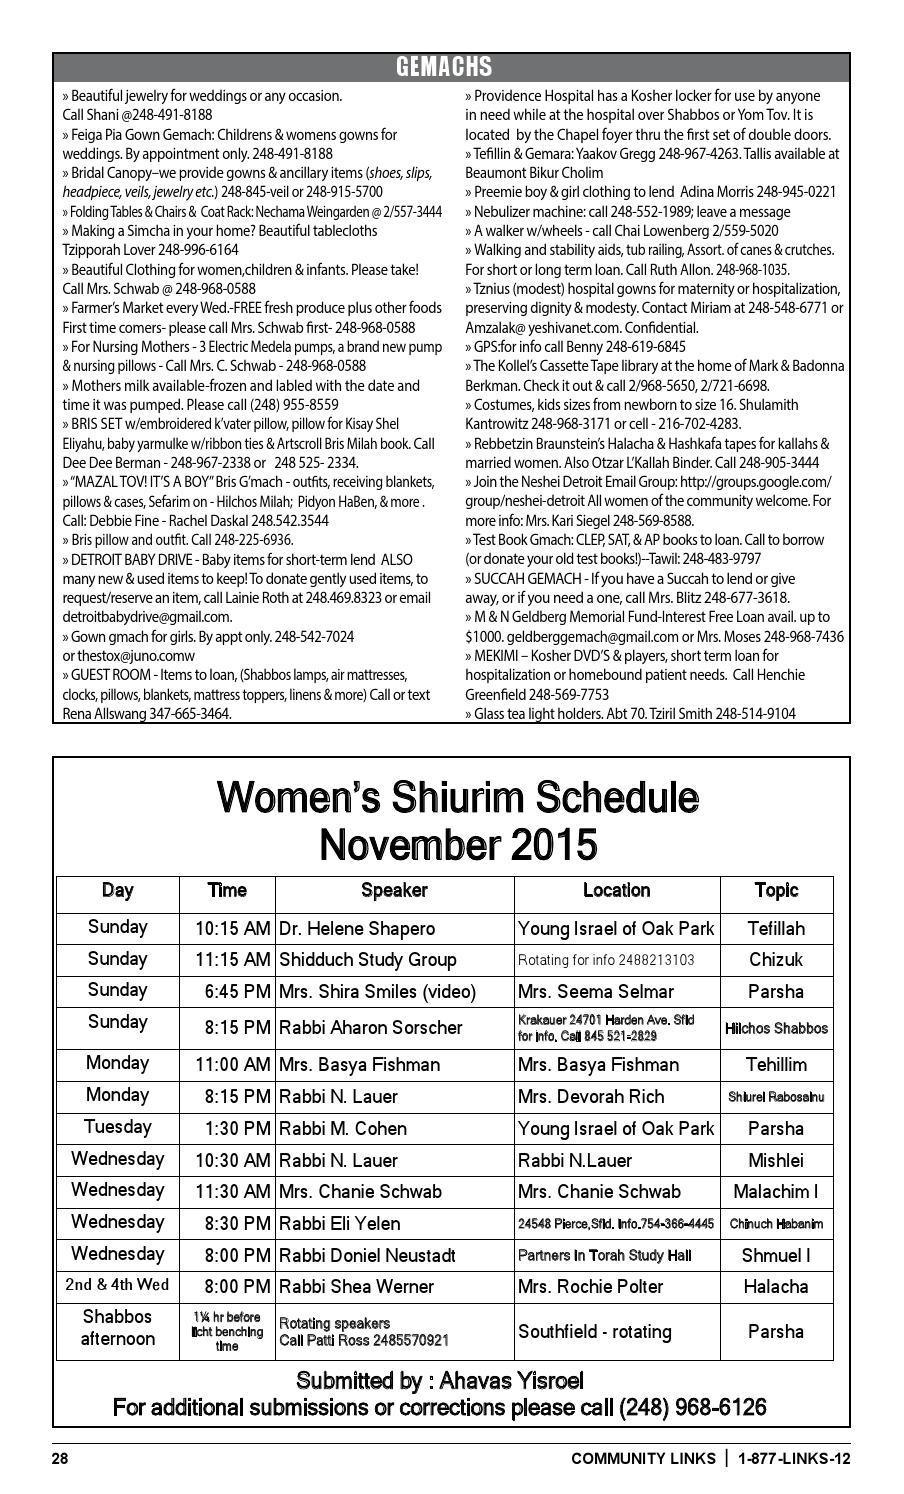 November 2015 by The Community Links Detroit - issuu